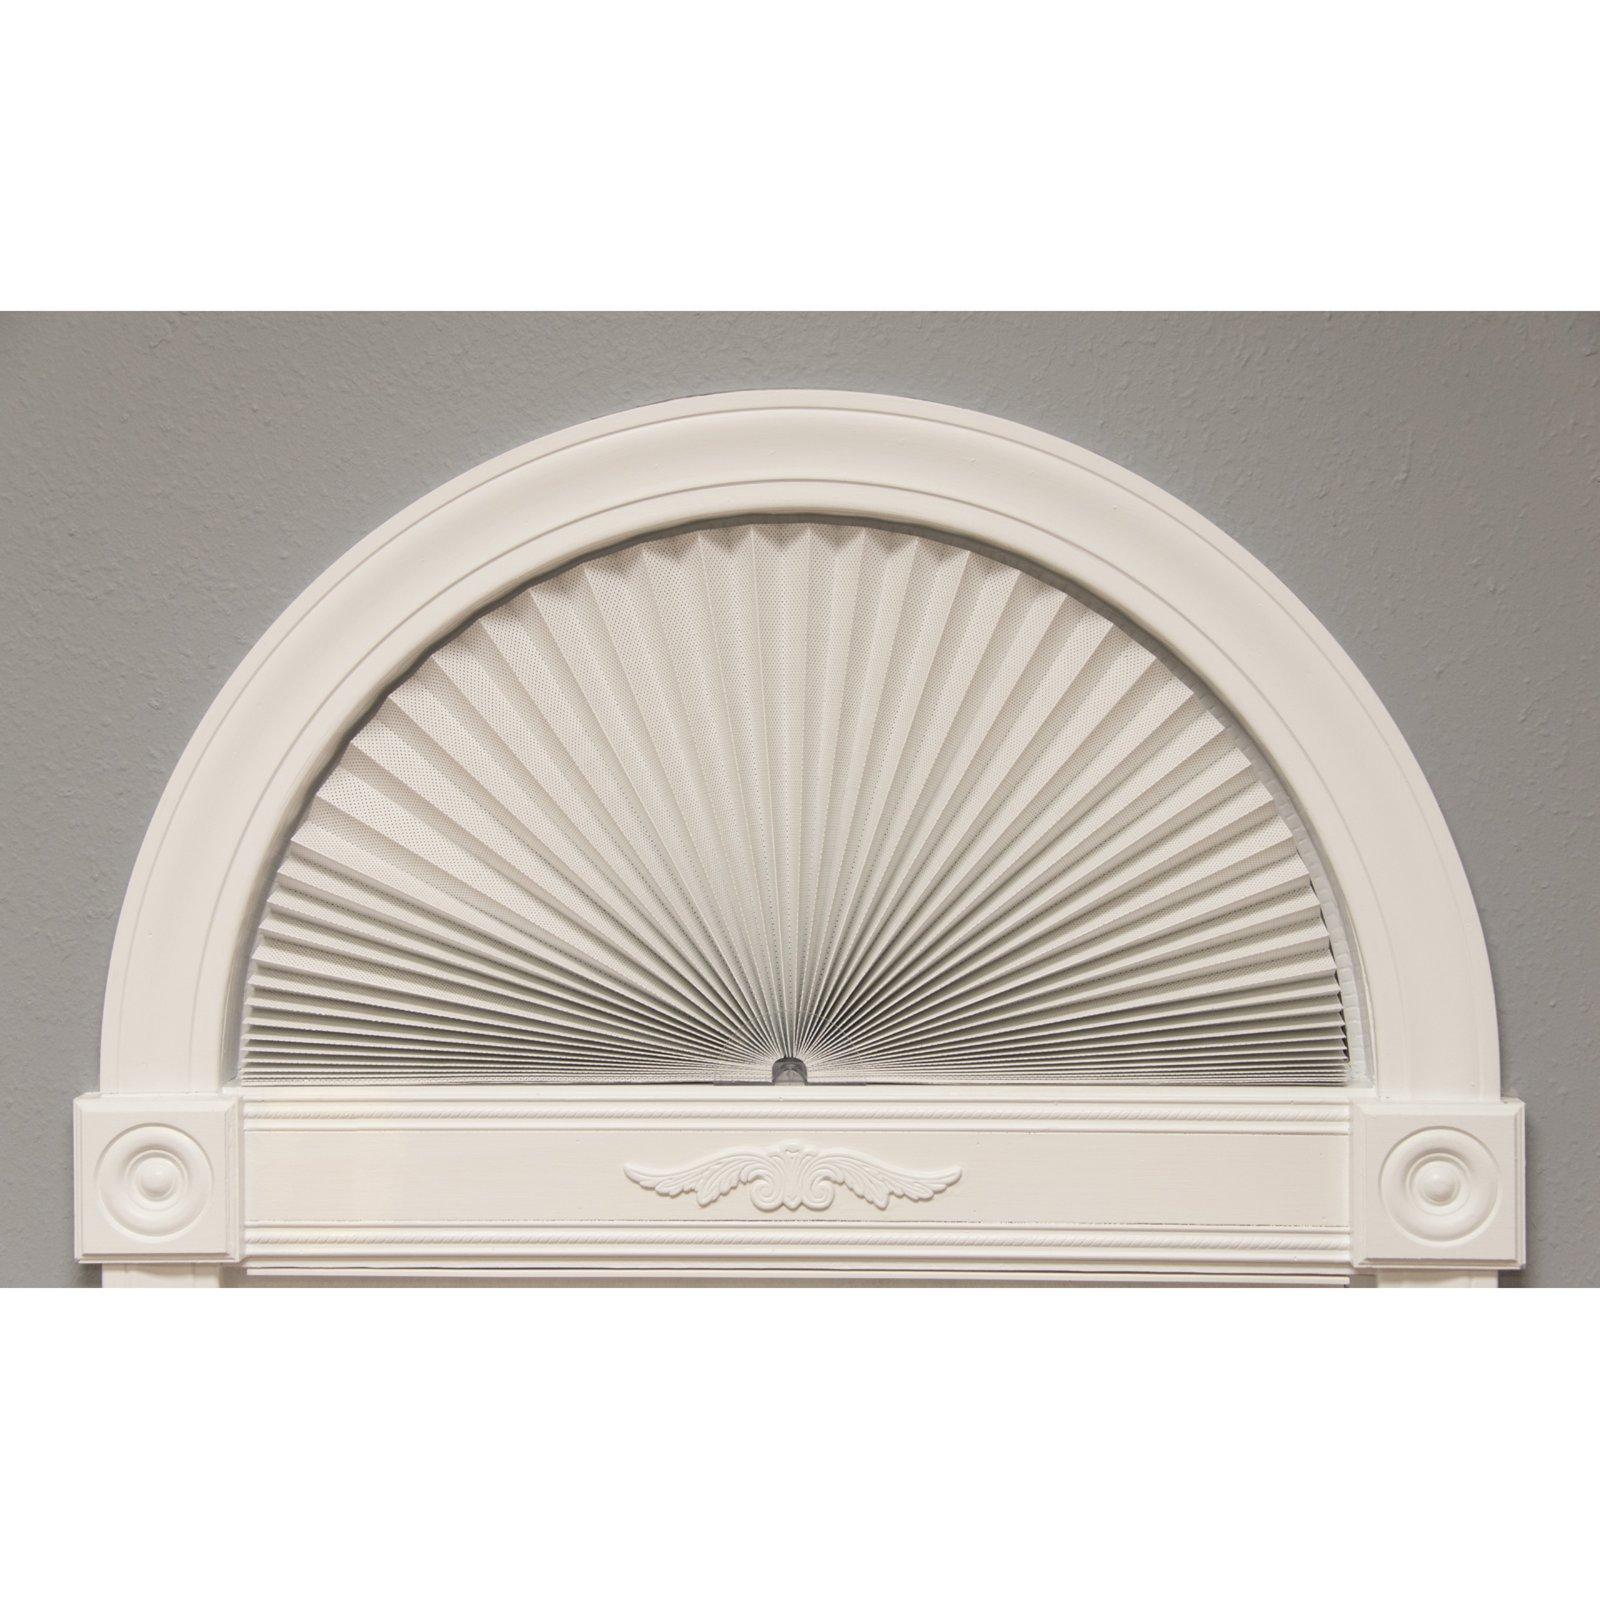 Redi Shade Original Arch Sheer View Solar Fabric Window Shade